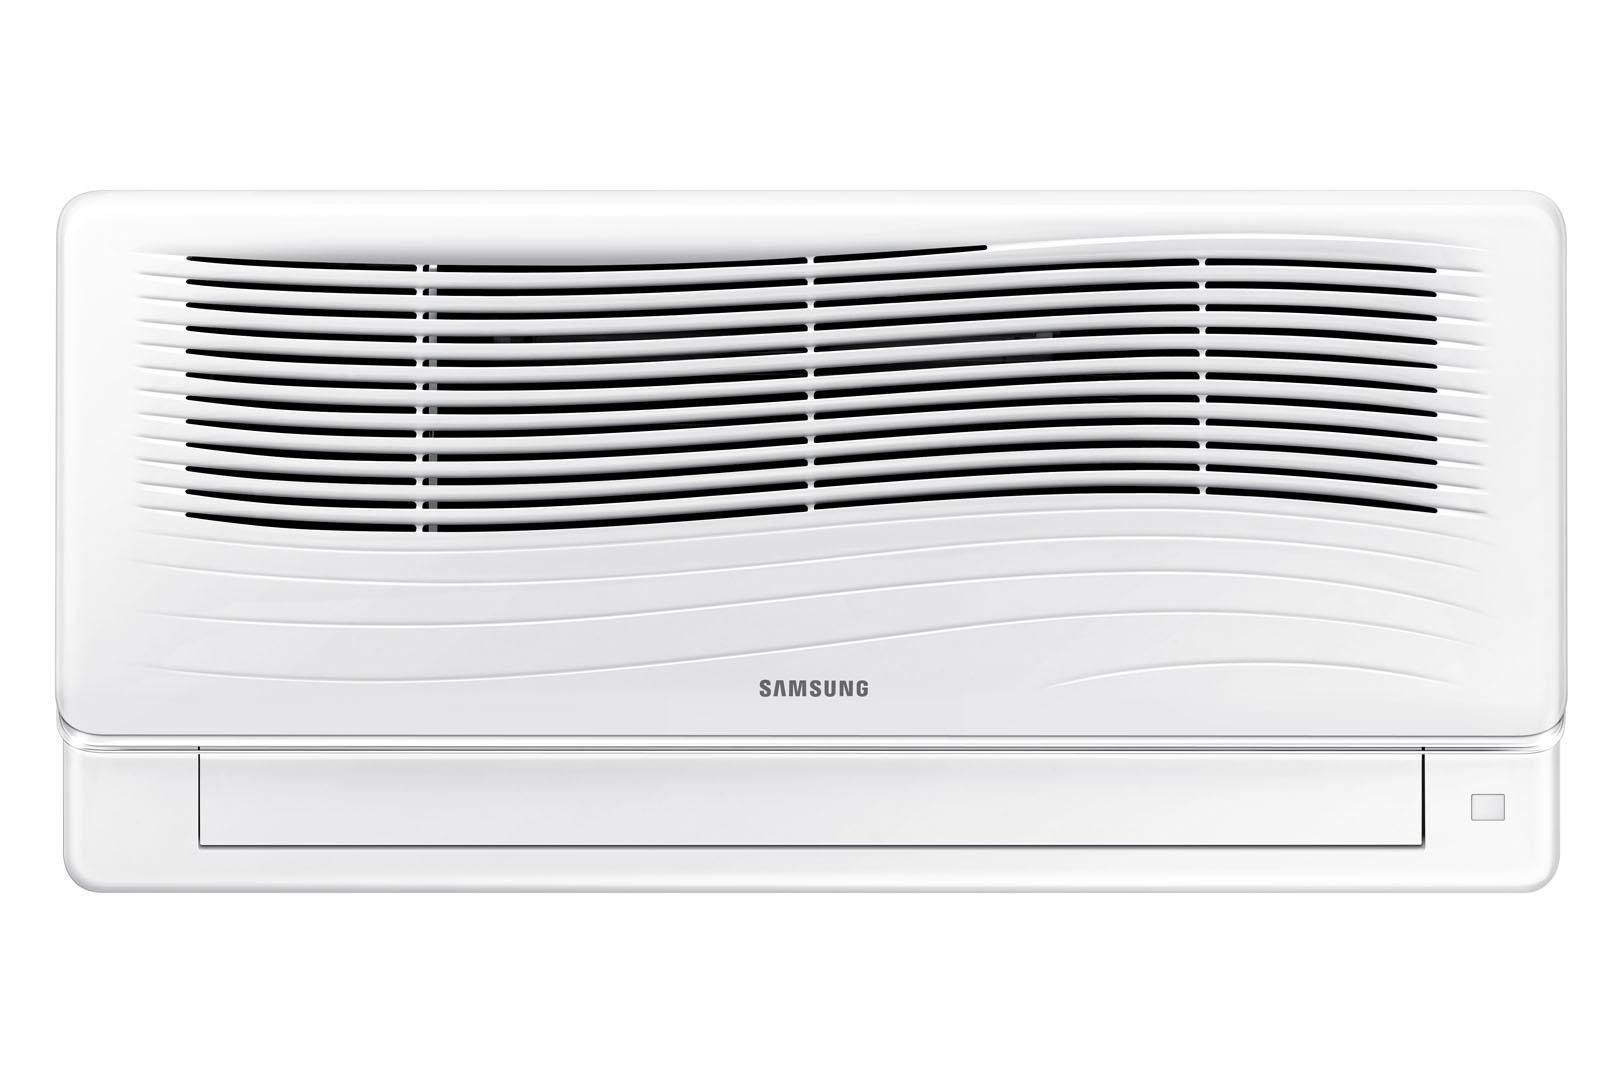 Samsung 1-weg cassette warmtepomp airco voor DVM S vrf systeem